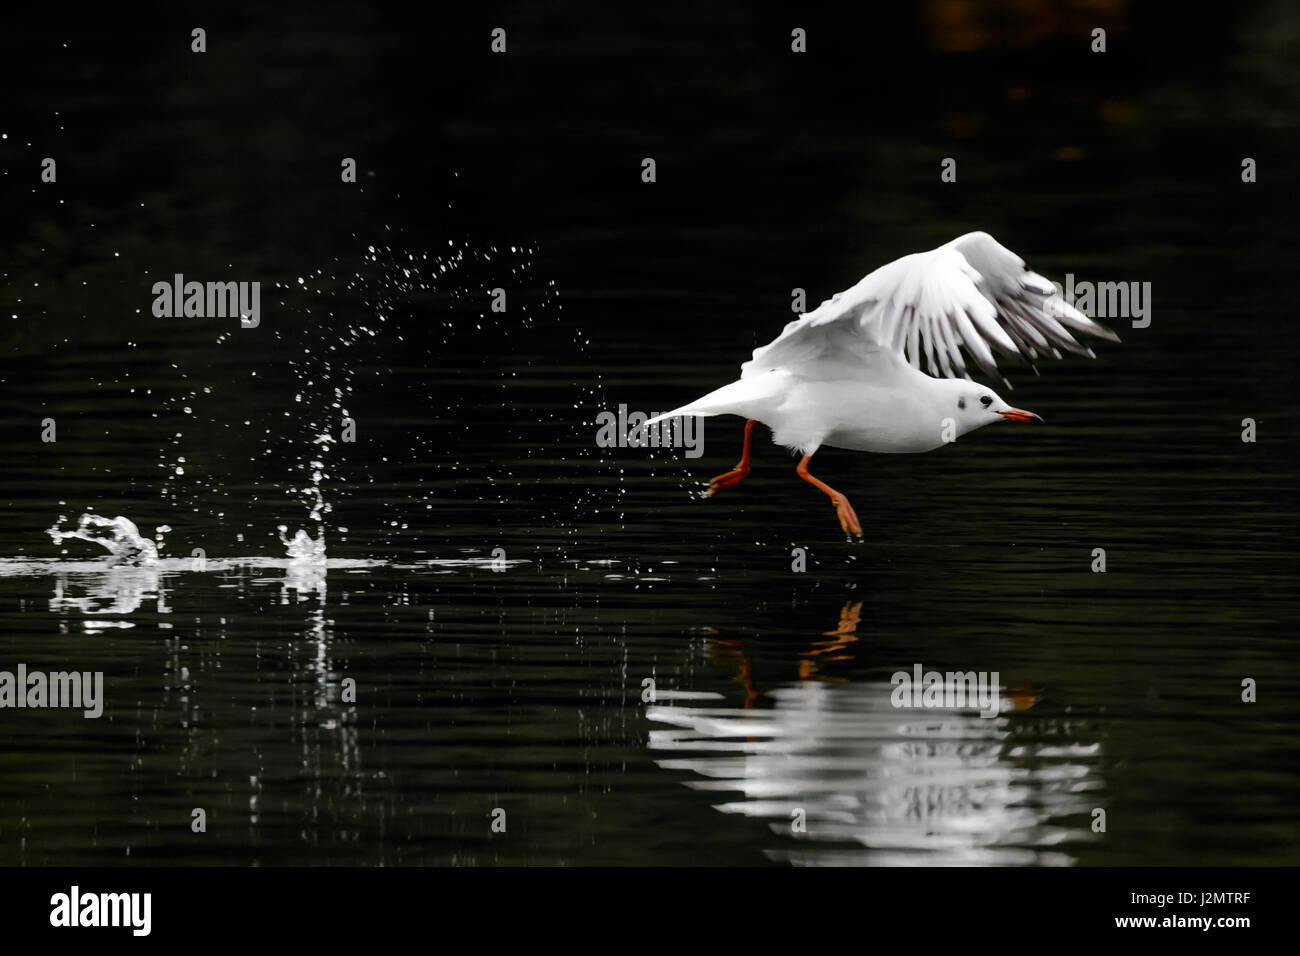 Black-headed gull (Chroicocephalus ridibundus) in winter plumage,  taking off from water against dark background Stock Photo